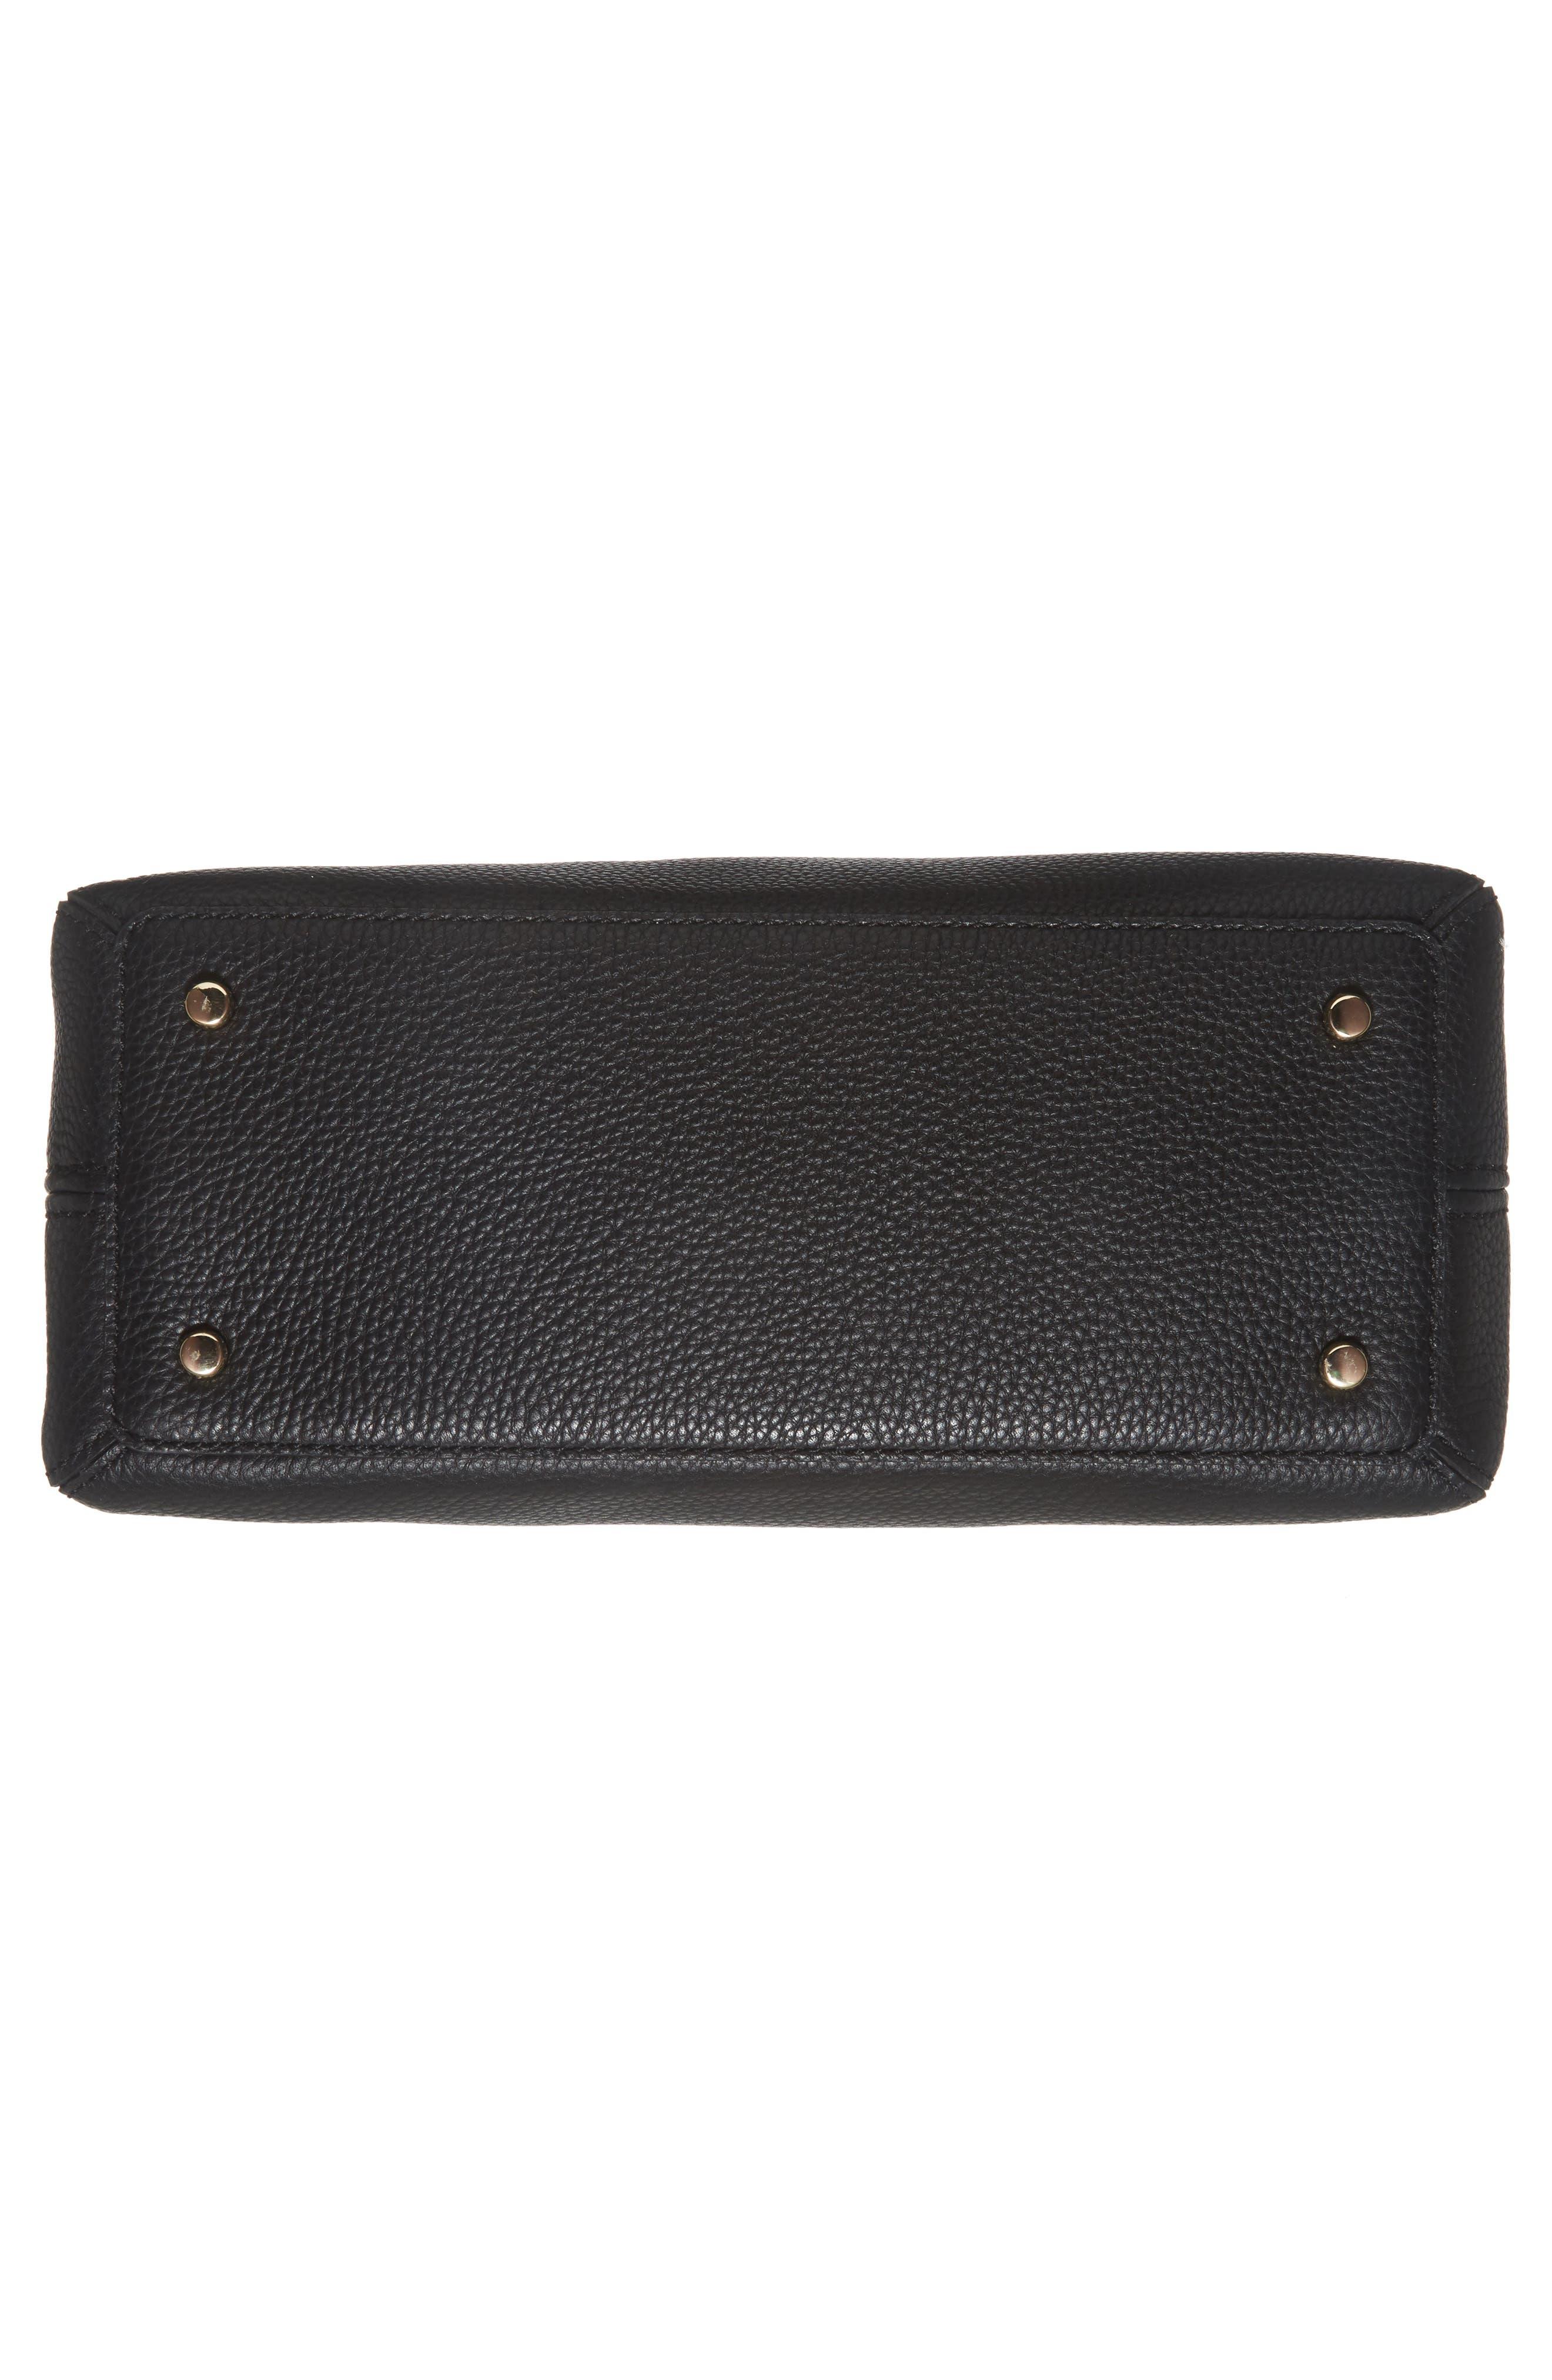 jackson street lottie leather satchel,                             Alternate thumbnail 17, color,